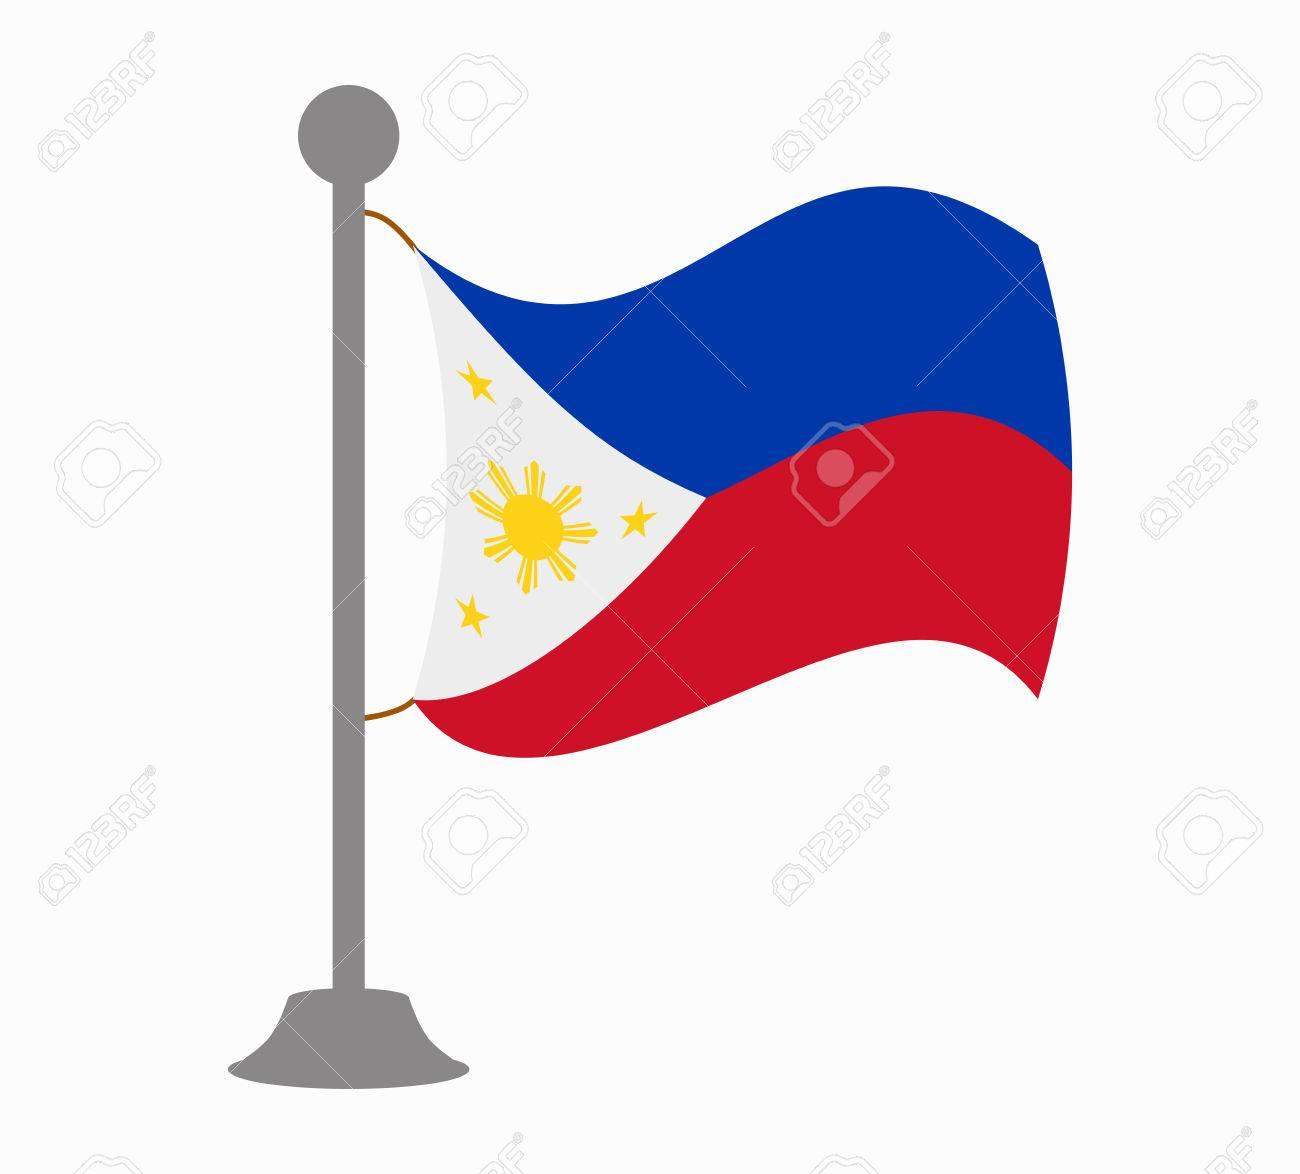 Philippines flag mast royalty free cliparts vectors and stock philippines flag mast stock vector 63214856 biocorpaavc Choice Image